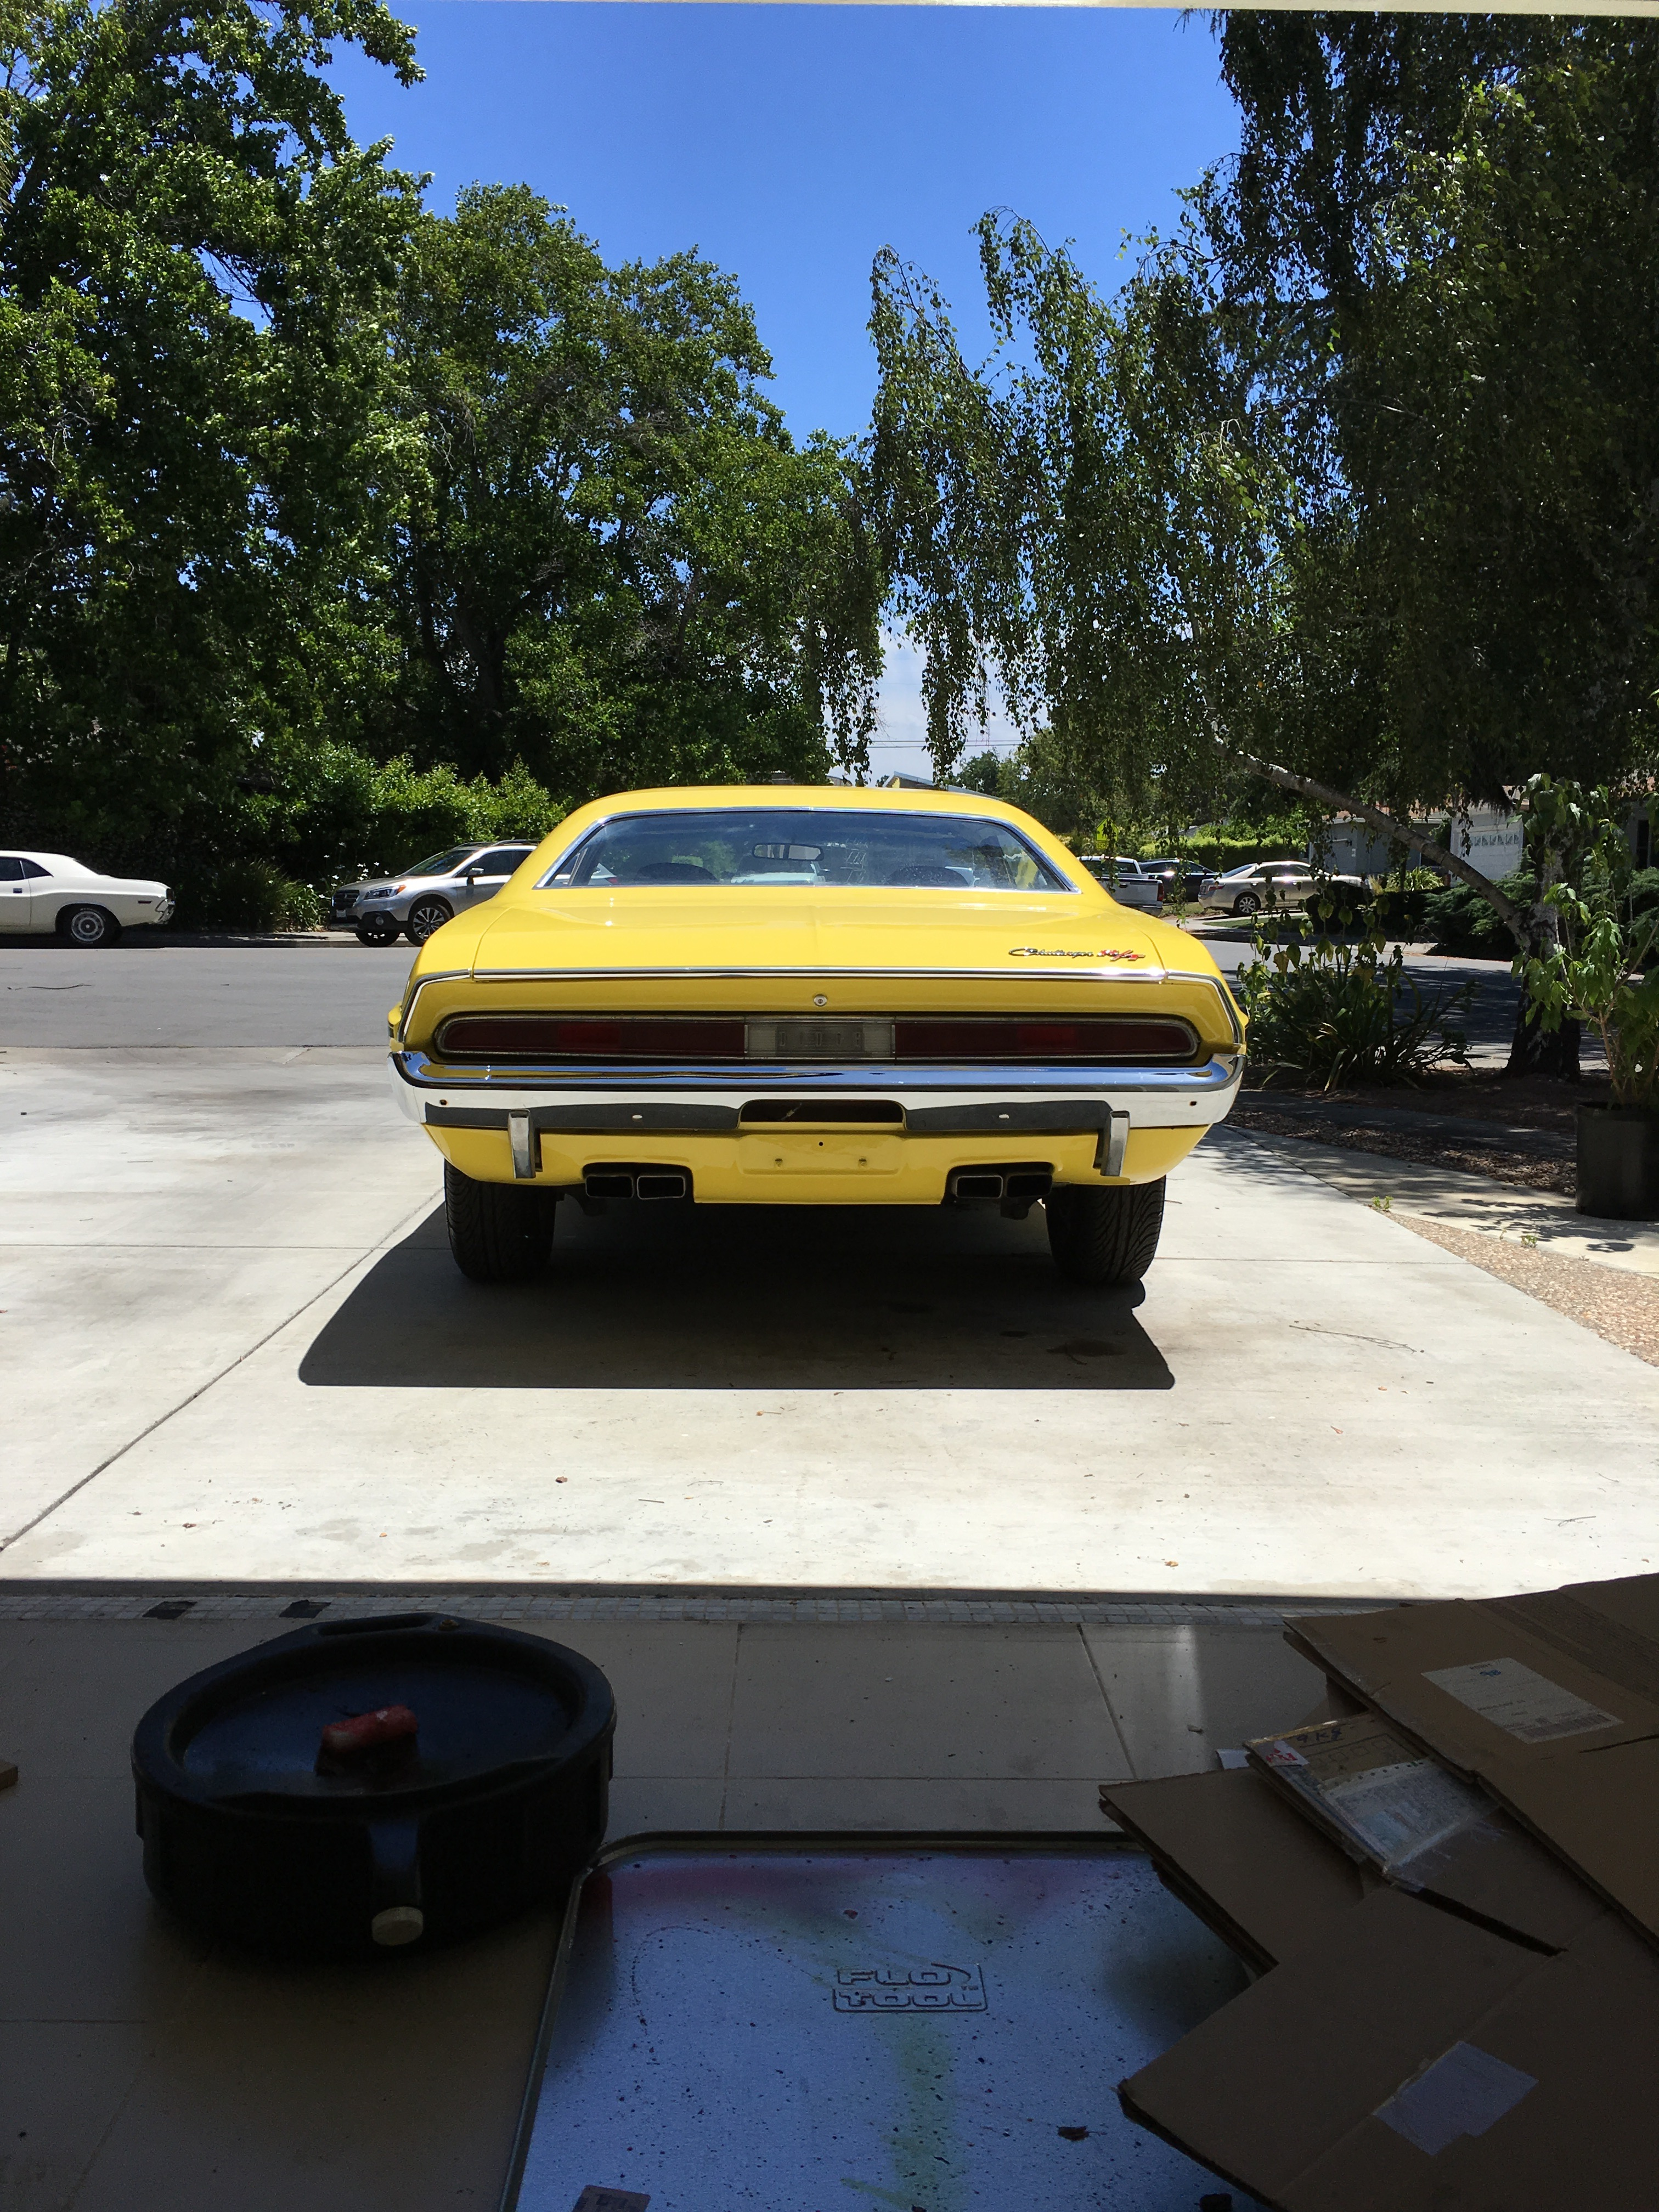 1970 Dodge Charger Rt: 1970 Dodge Challenger R/T 383 Magnum